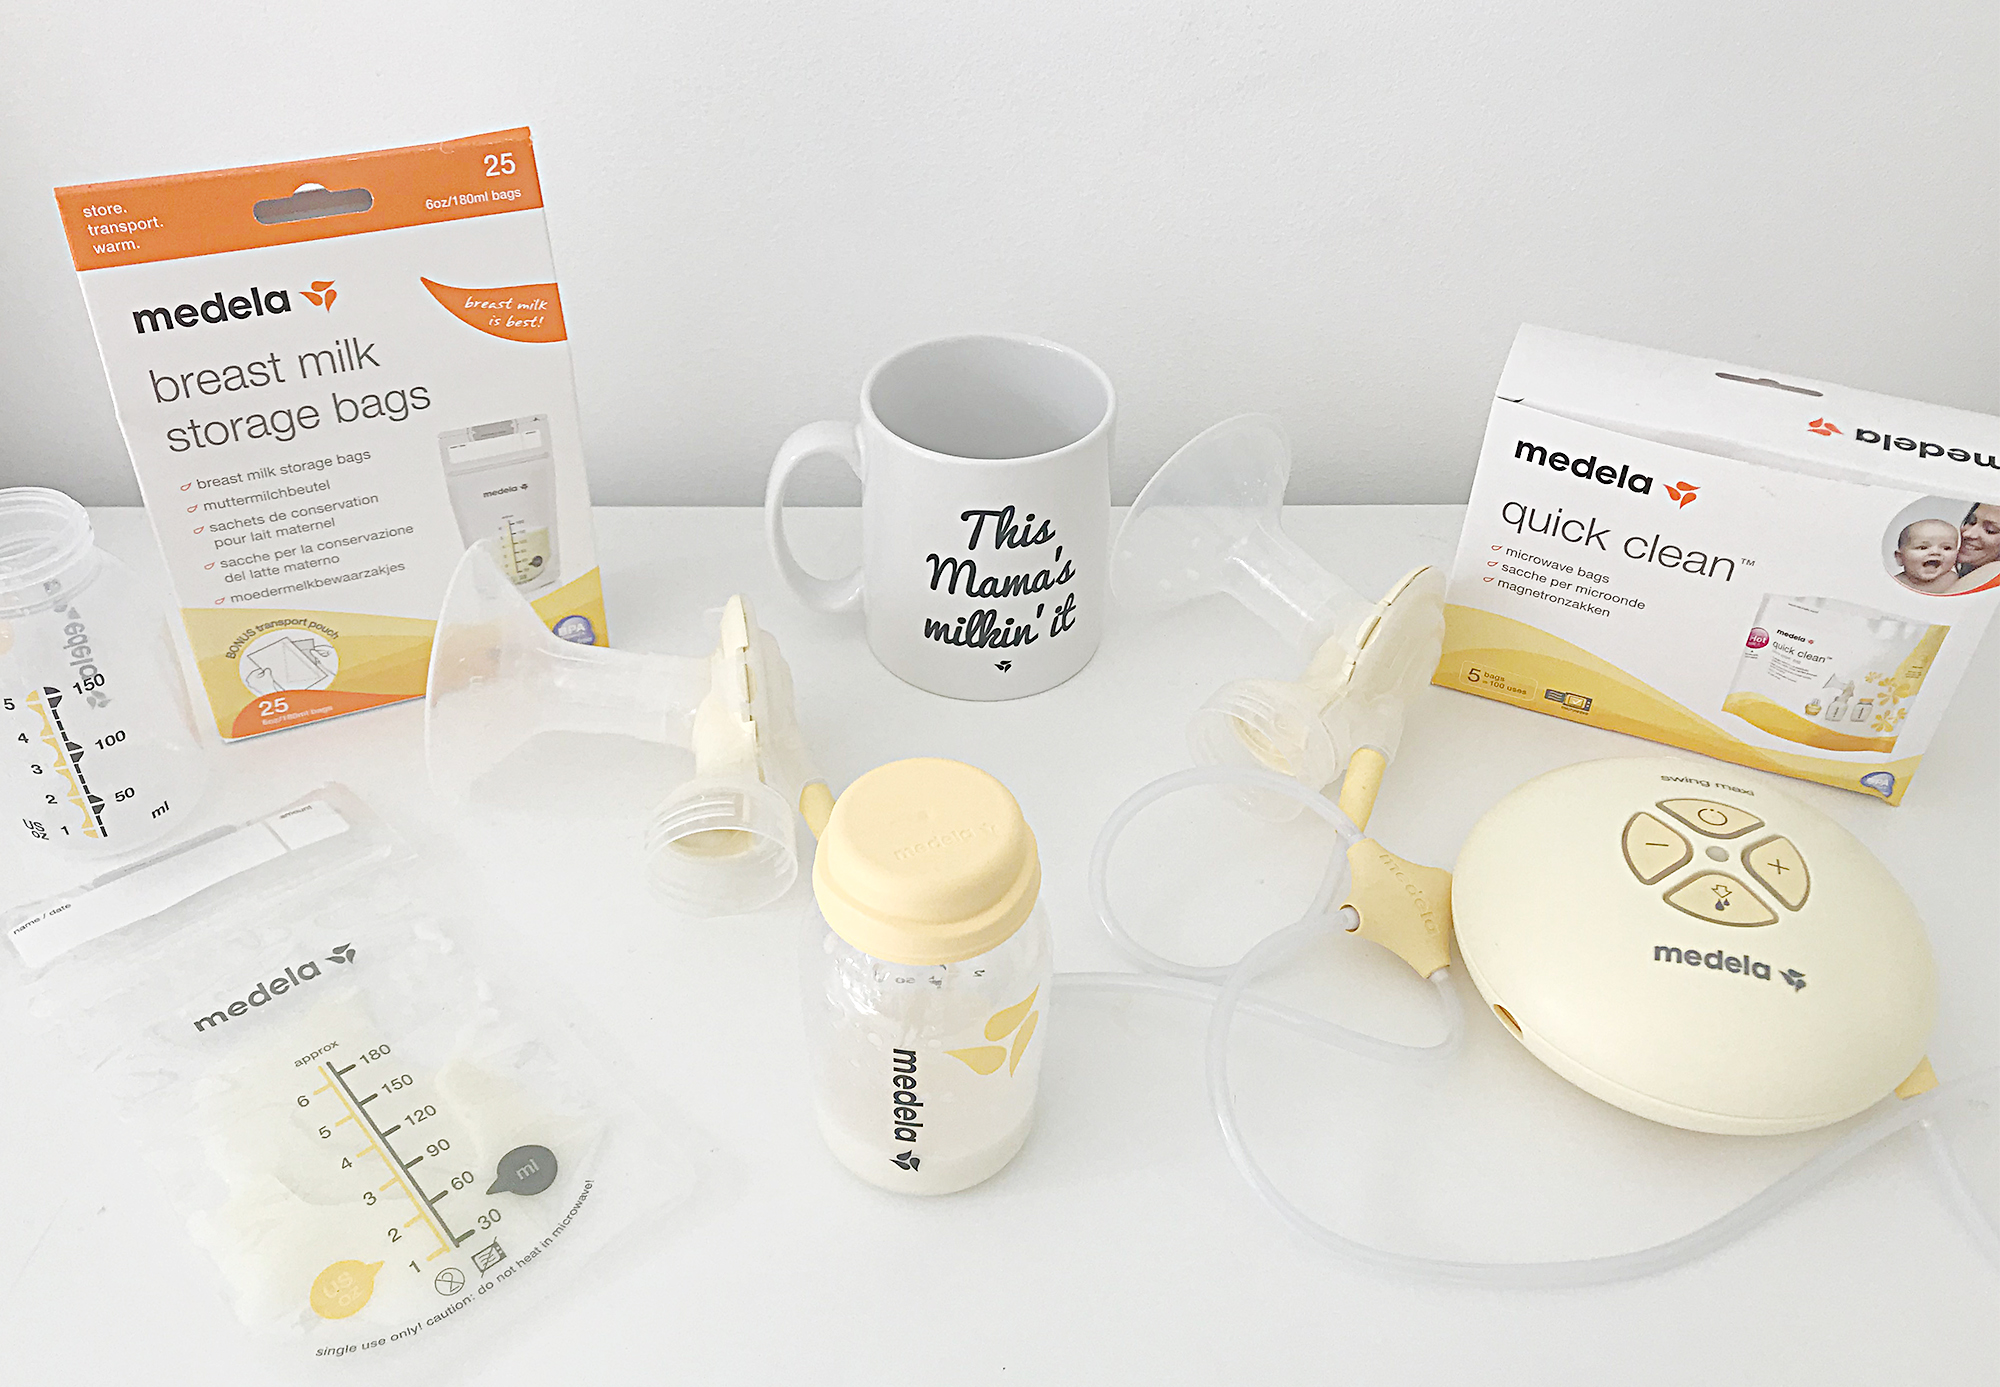 Breastfeeding Medela Swing maxi double electric breast pump